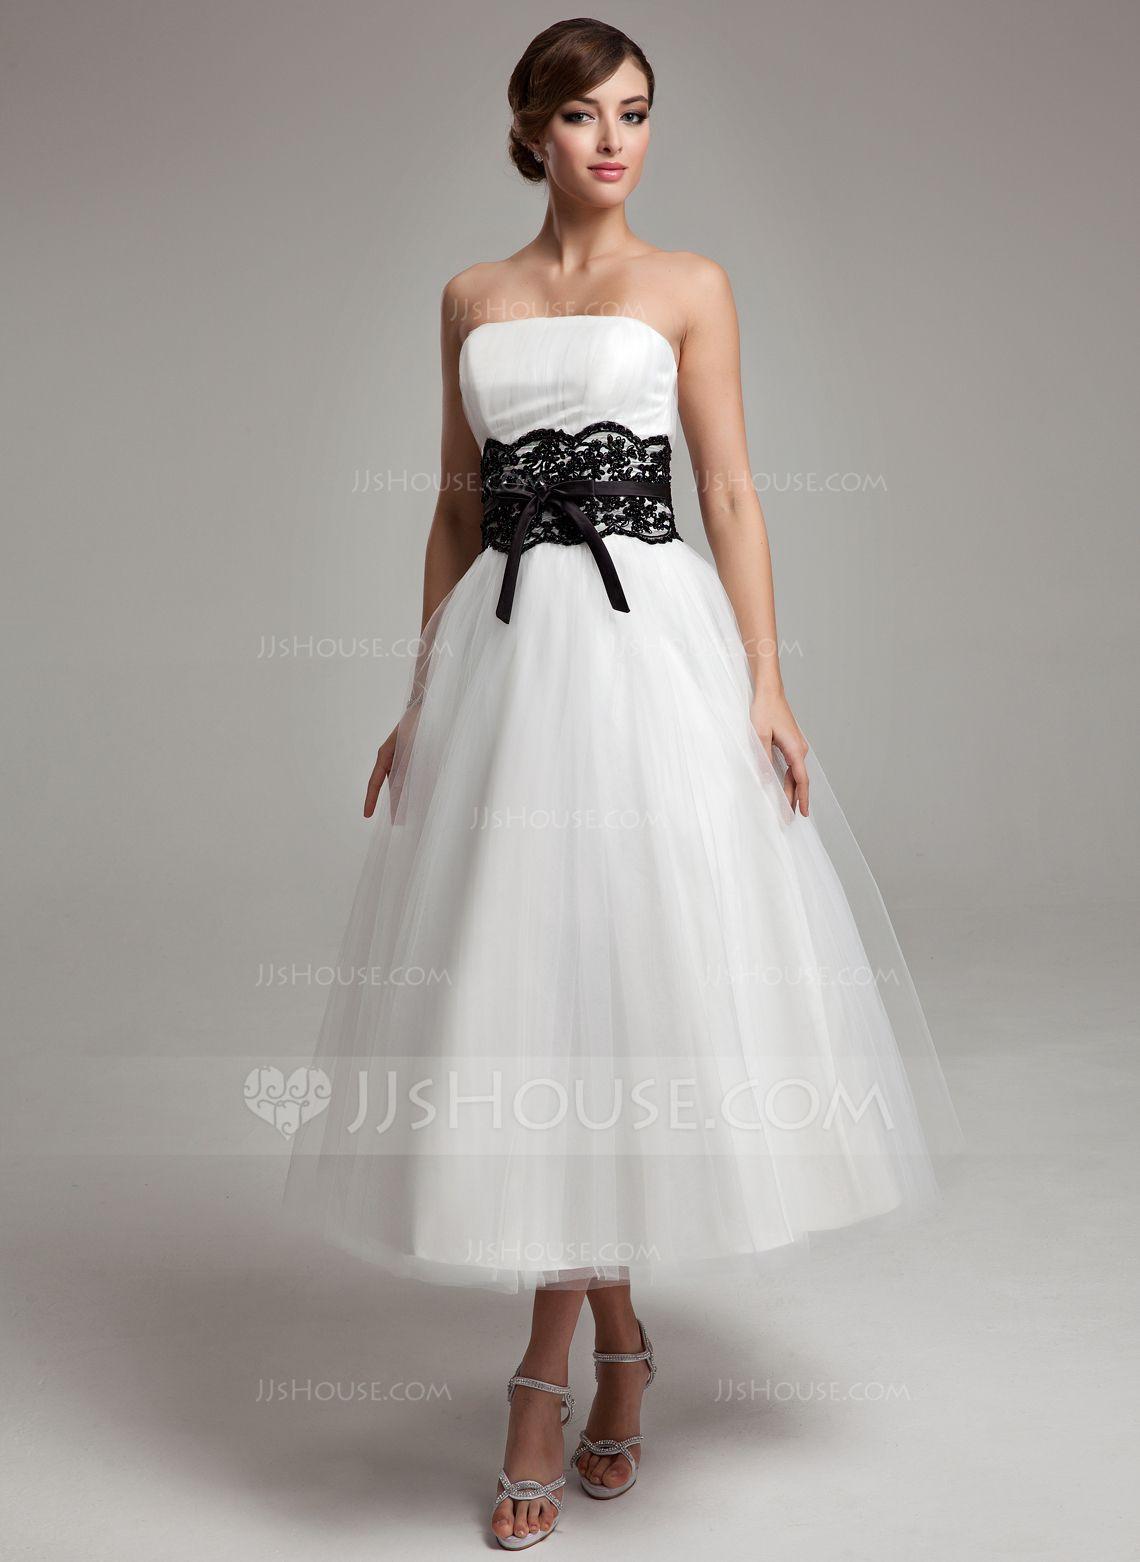 A lineprincess strapless tea length tulle wedding dress with lace a lineprincess strapless tea length tulle wedding dress with lace sash beading bows 002011609 ombrellifo Choice Image